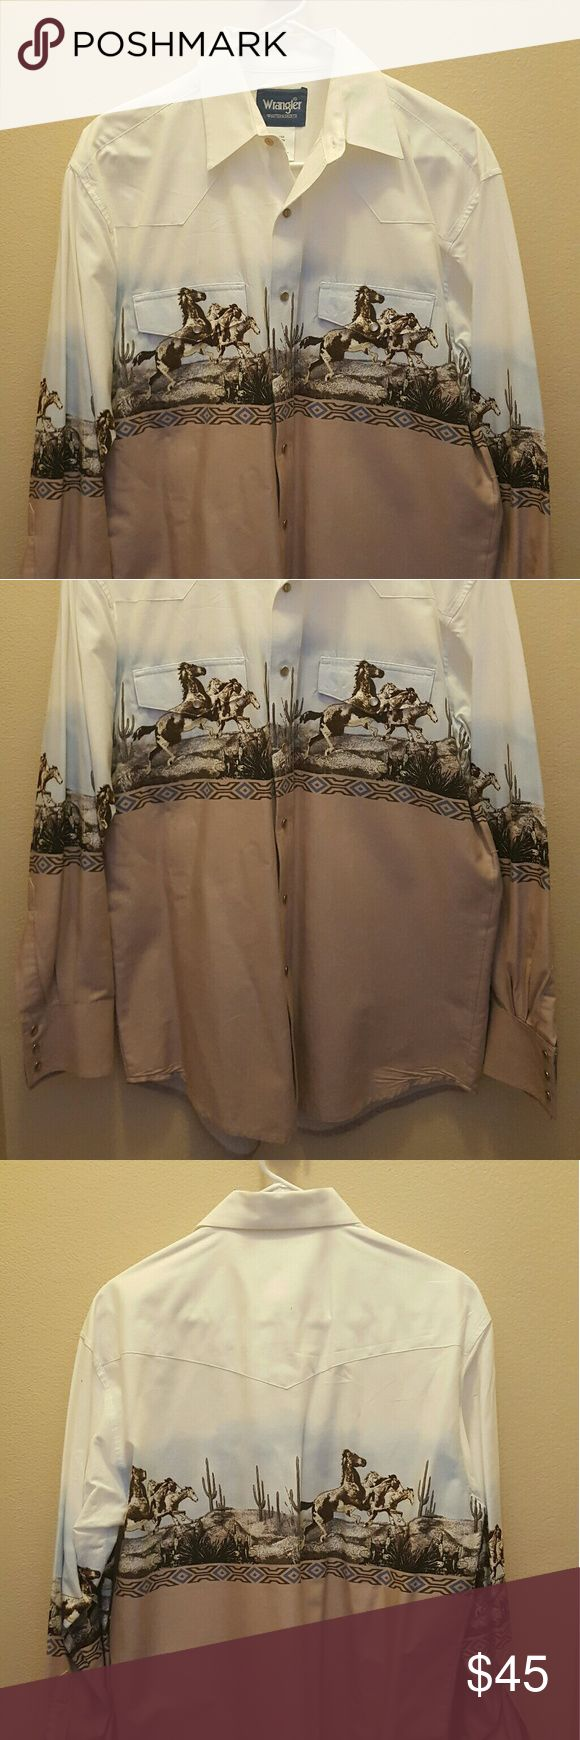 Western Shirt w Horse Print Wrangler Dress Shirt Wrangler Shirts Dress Shirts